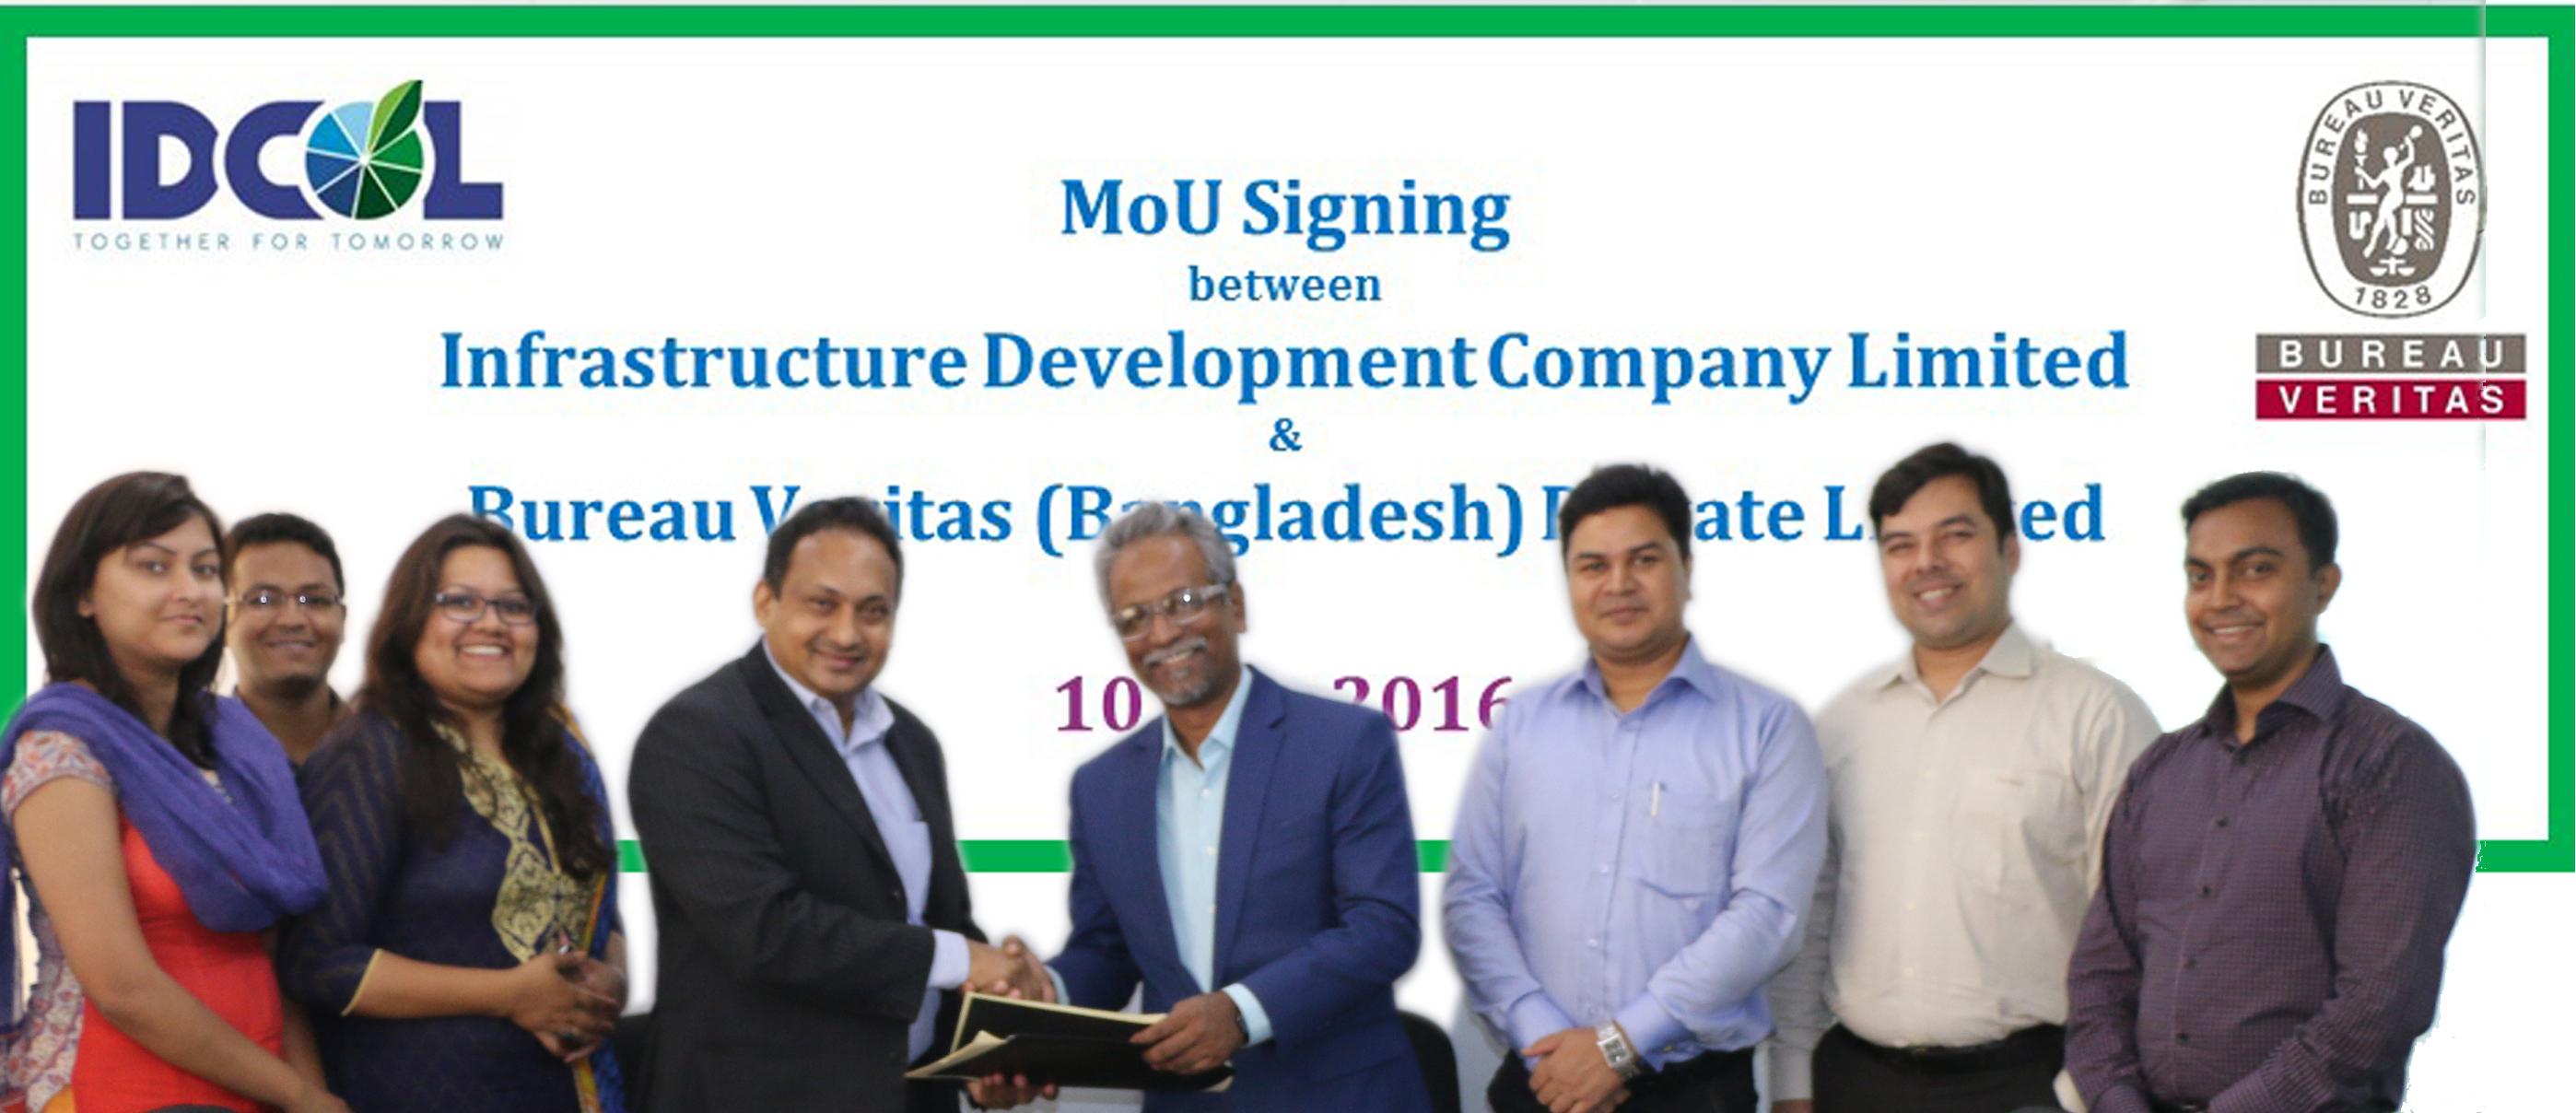 Infrastructure development company limited idcol - Bureau veritas france head office ...